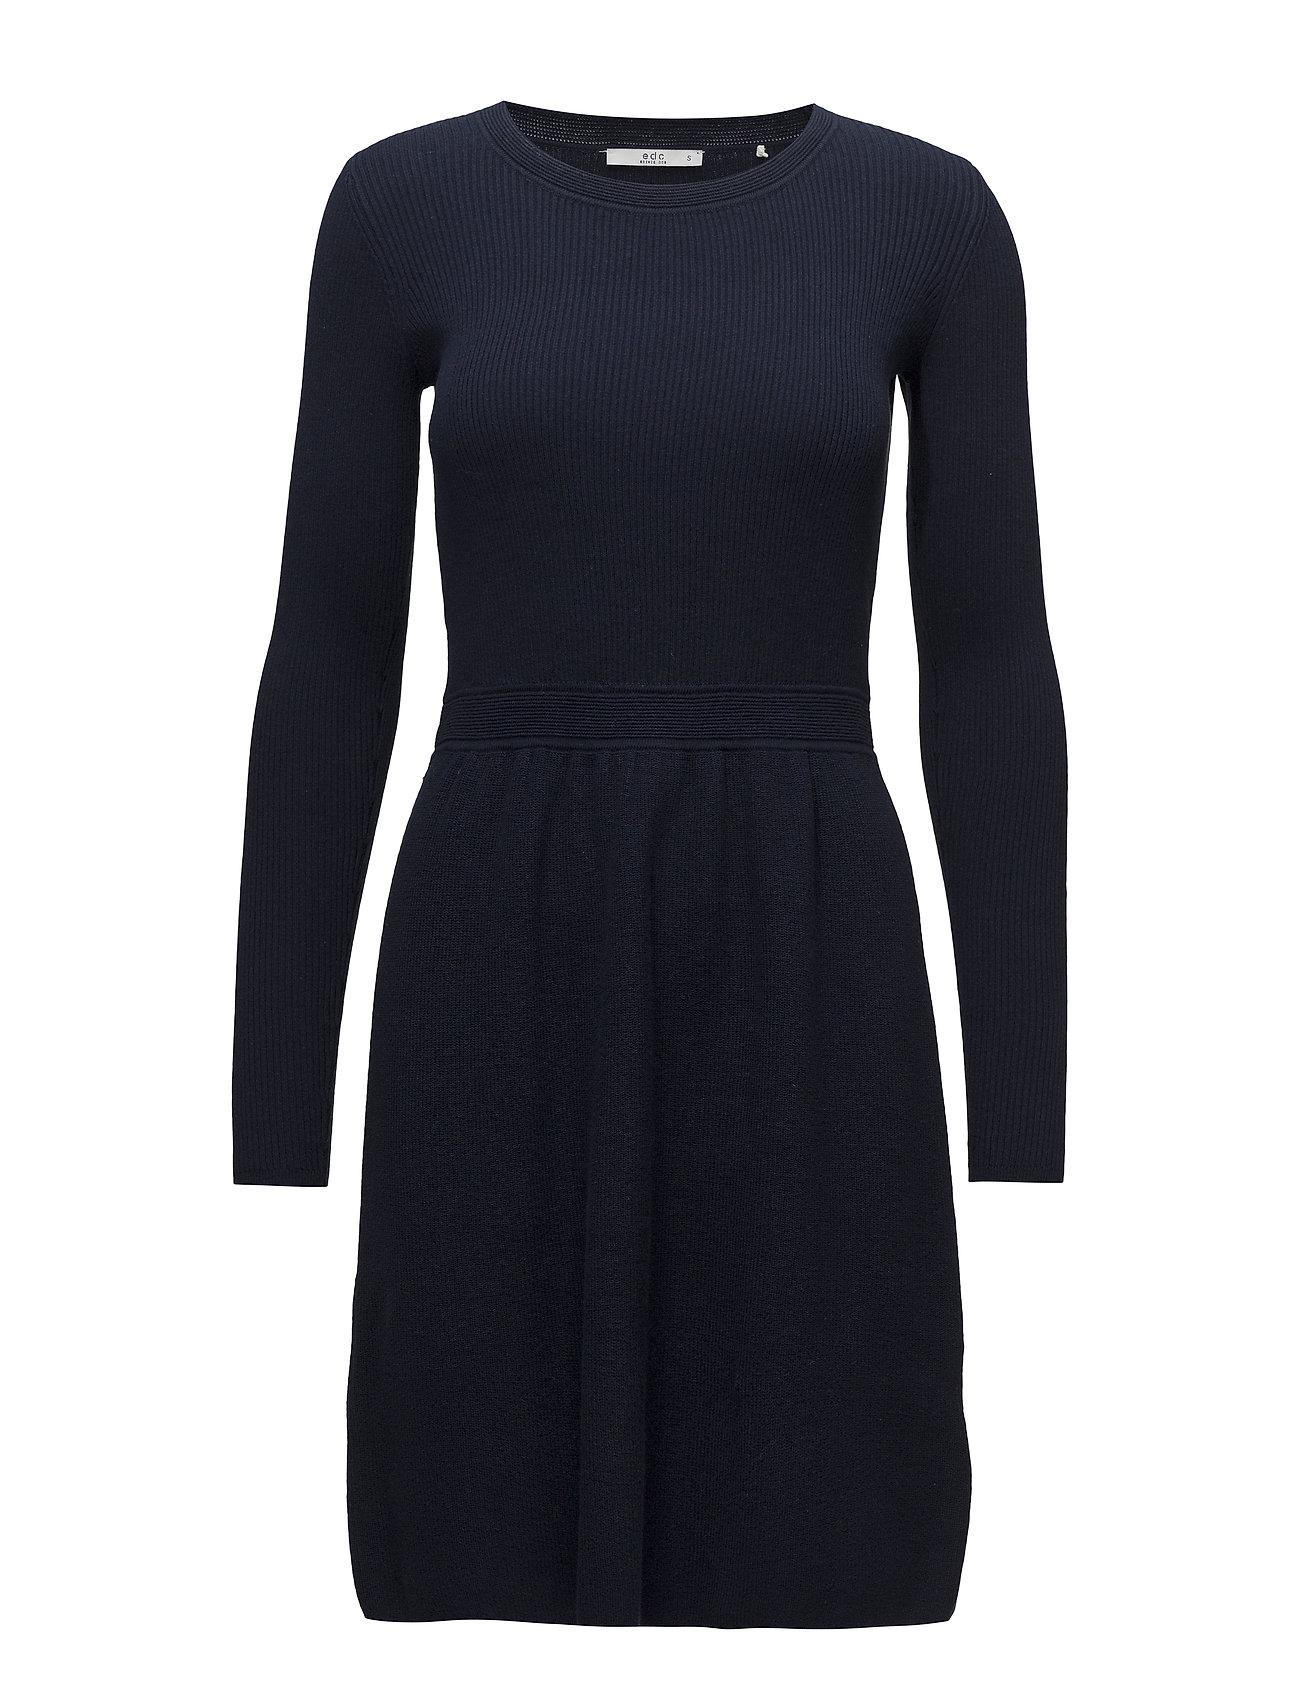 8ed0378dac6b2b Dresses Flat Knitted (Navy) (44.99 €) - EDC by Esprit - Jurken ...